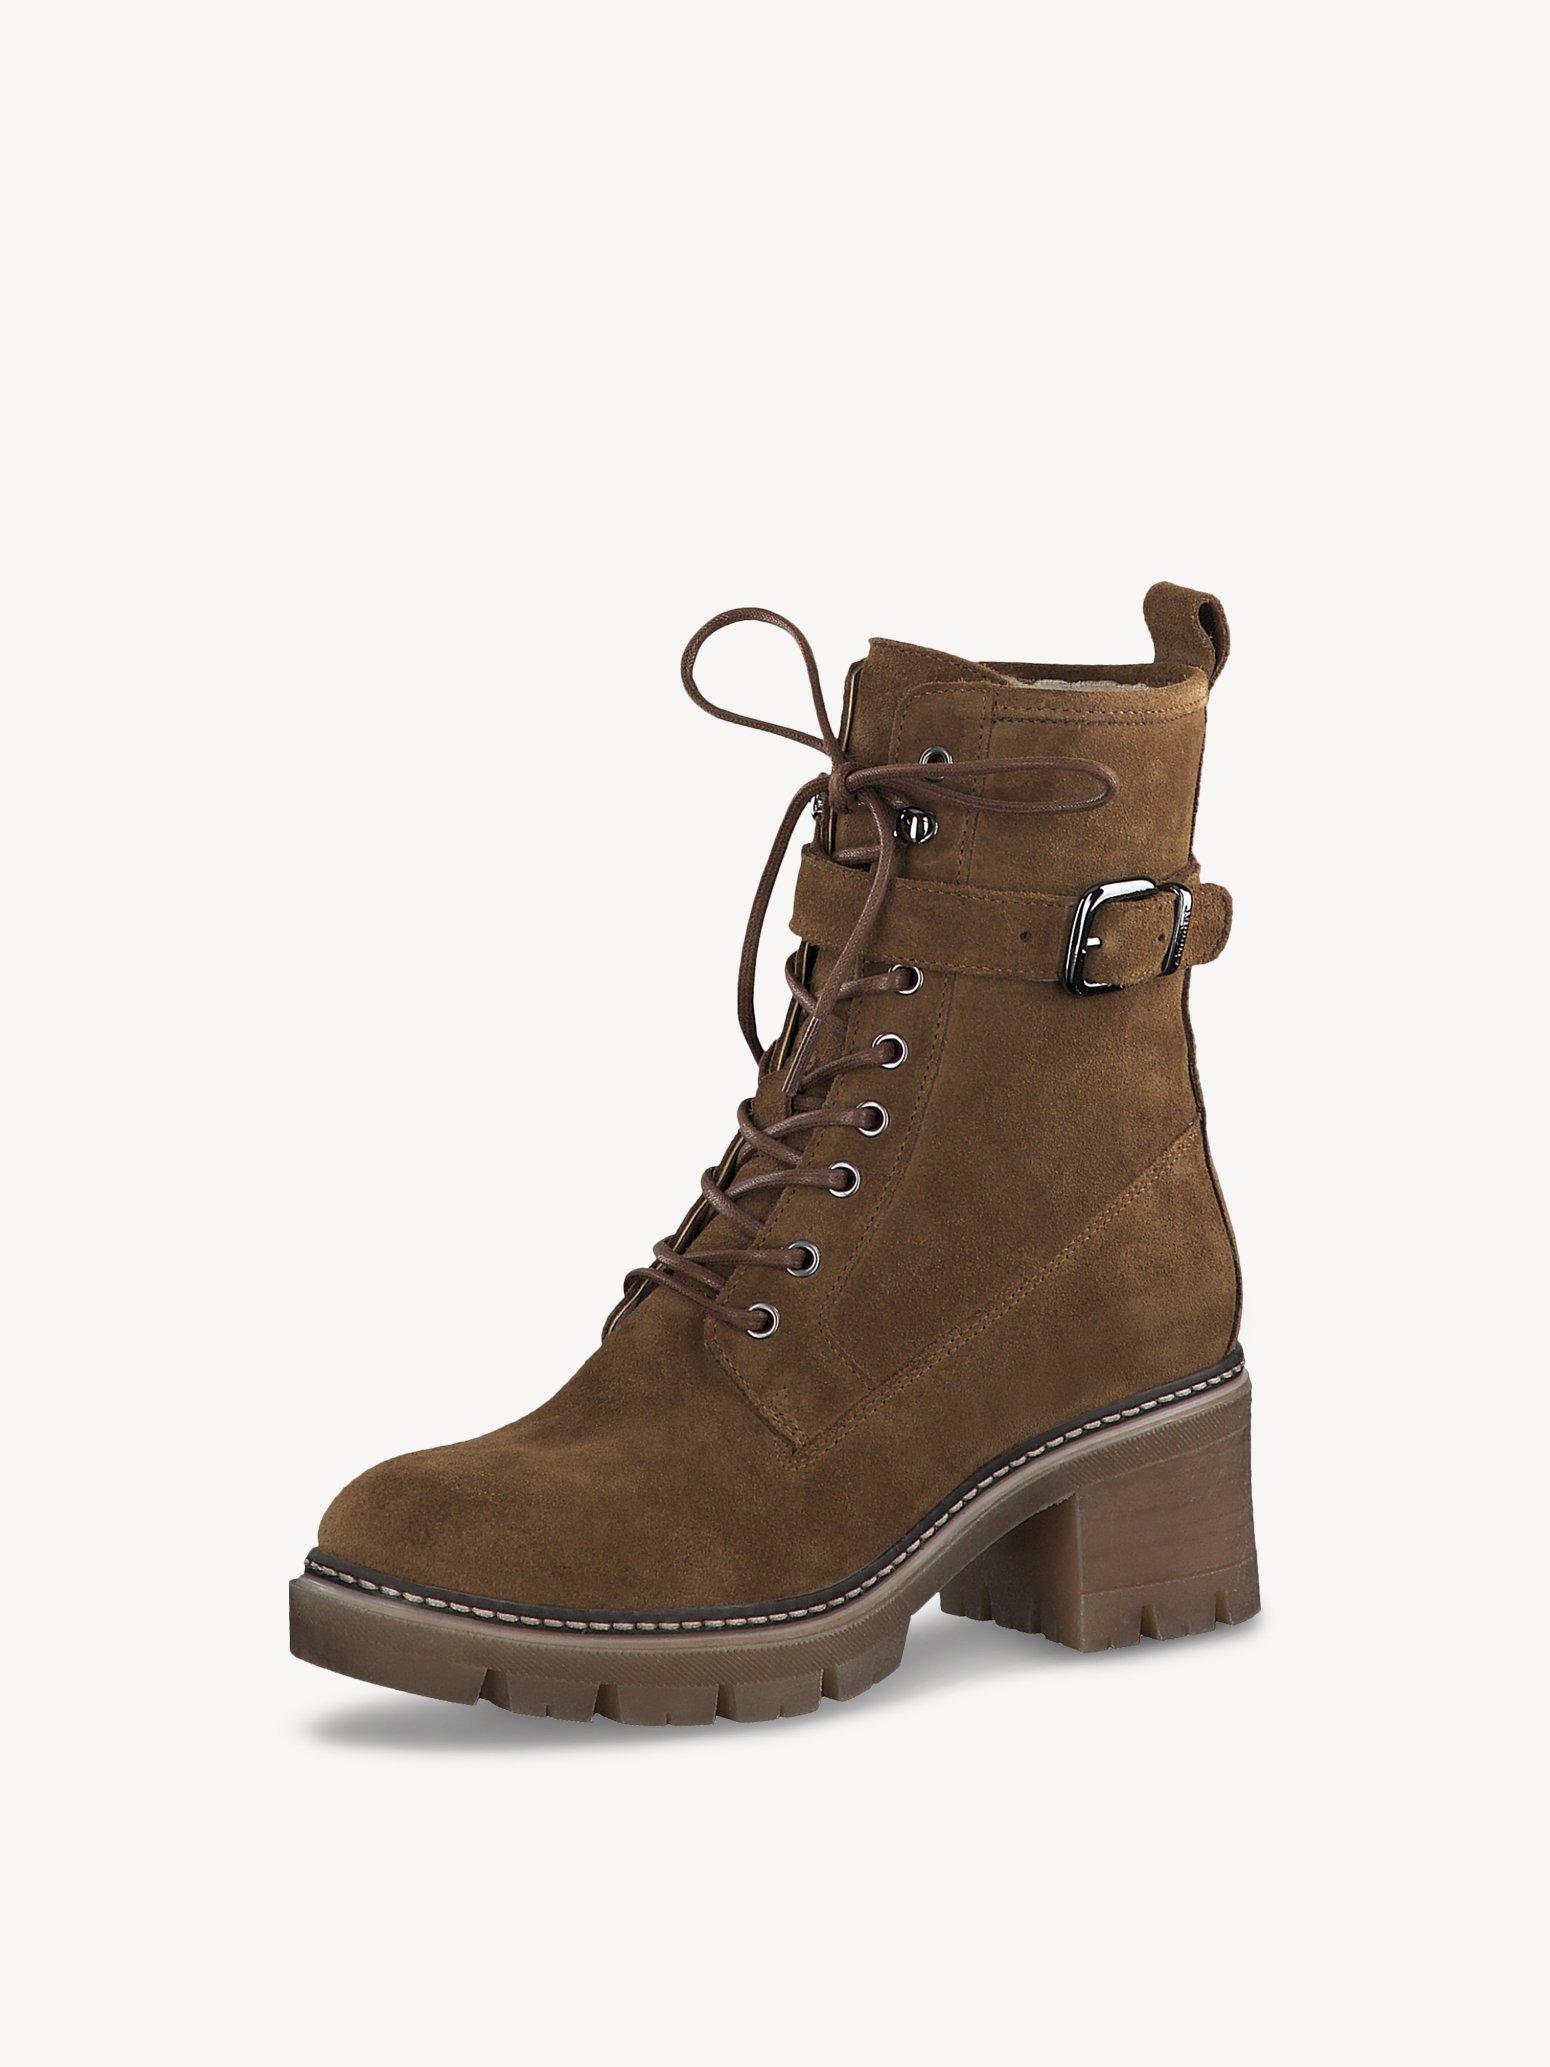 Ботинки Tamaris 1-1-26264-25-332